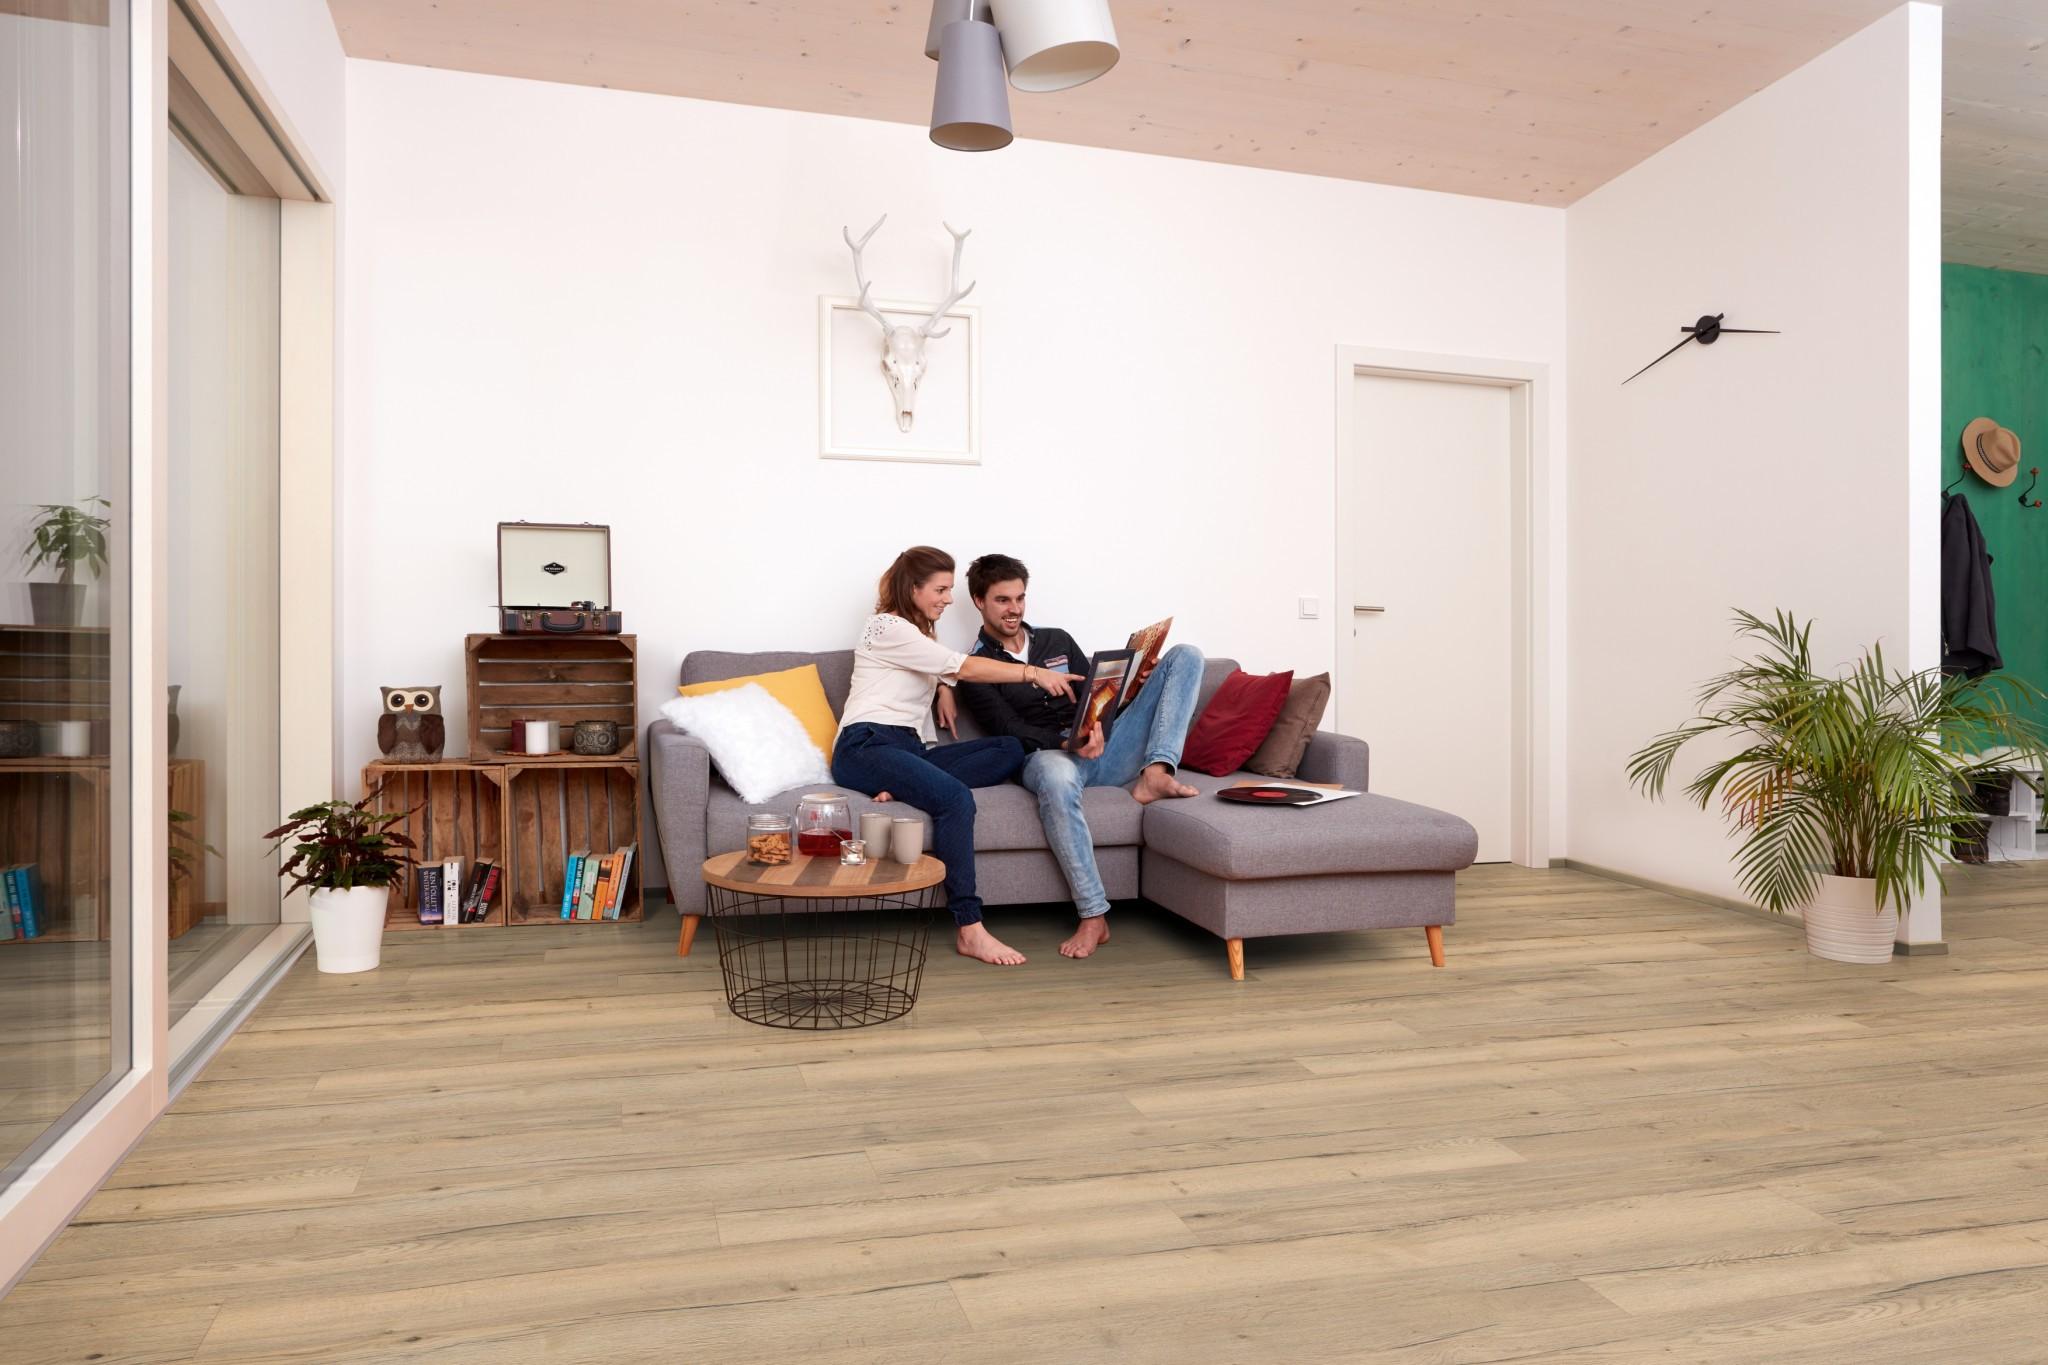 02PI_AP_PH_flo_home_comfort_livingroom_classic_wv4_EHC011_L7_01b